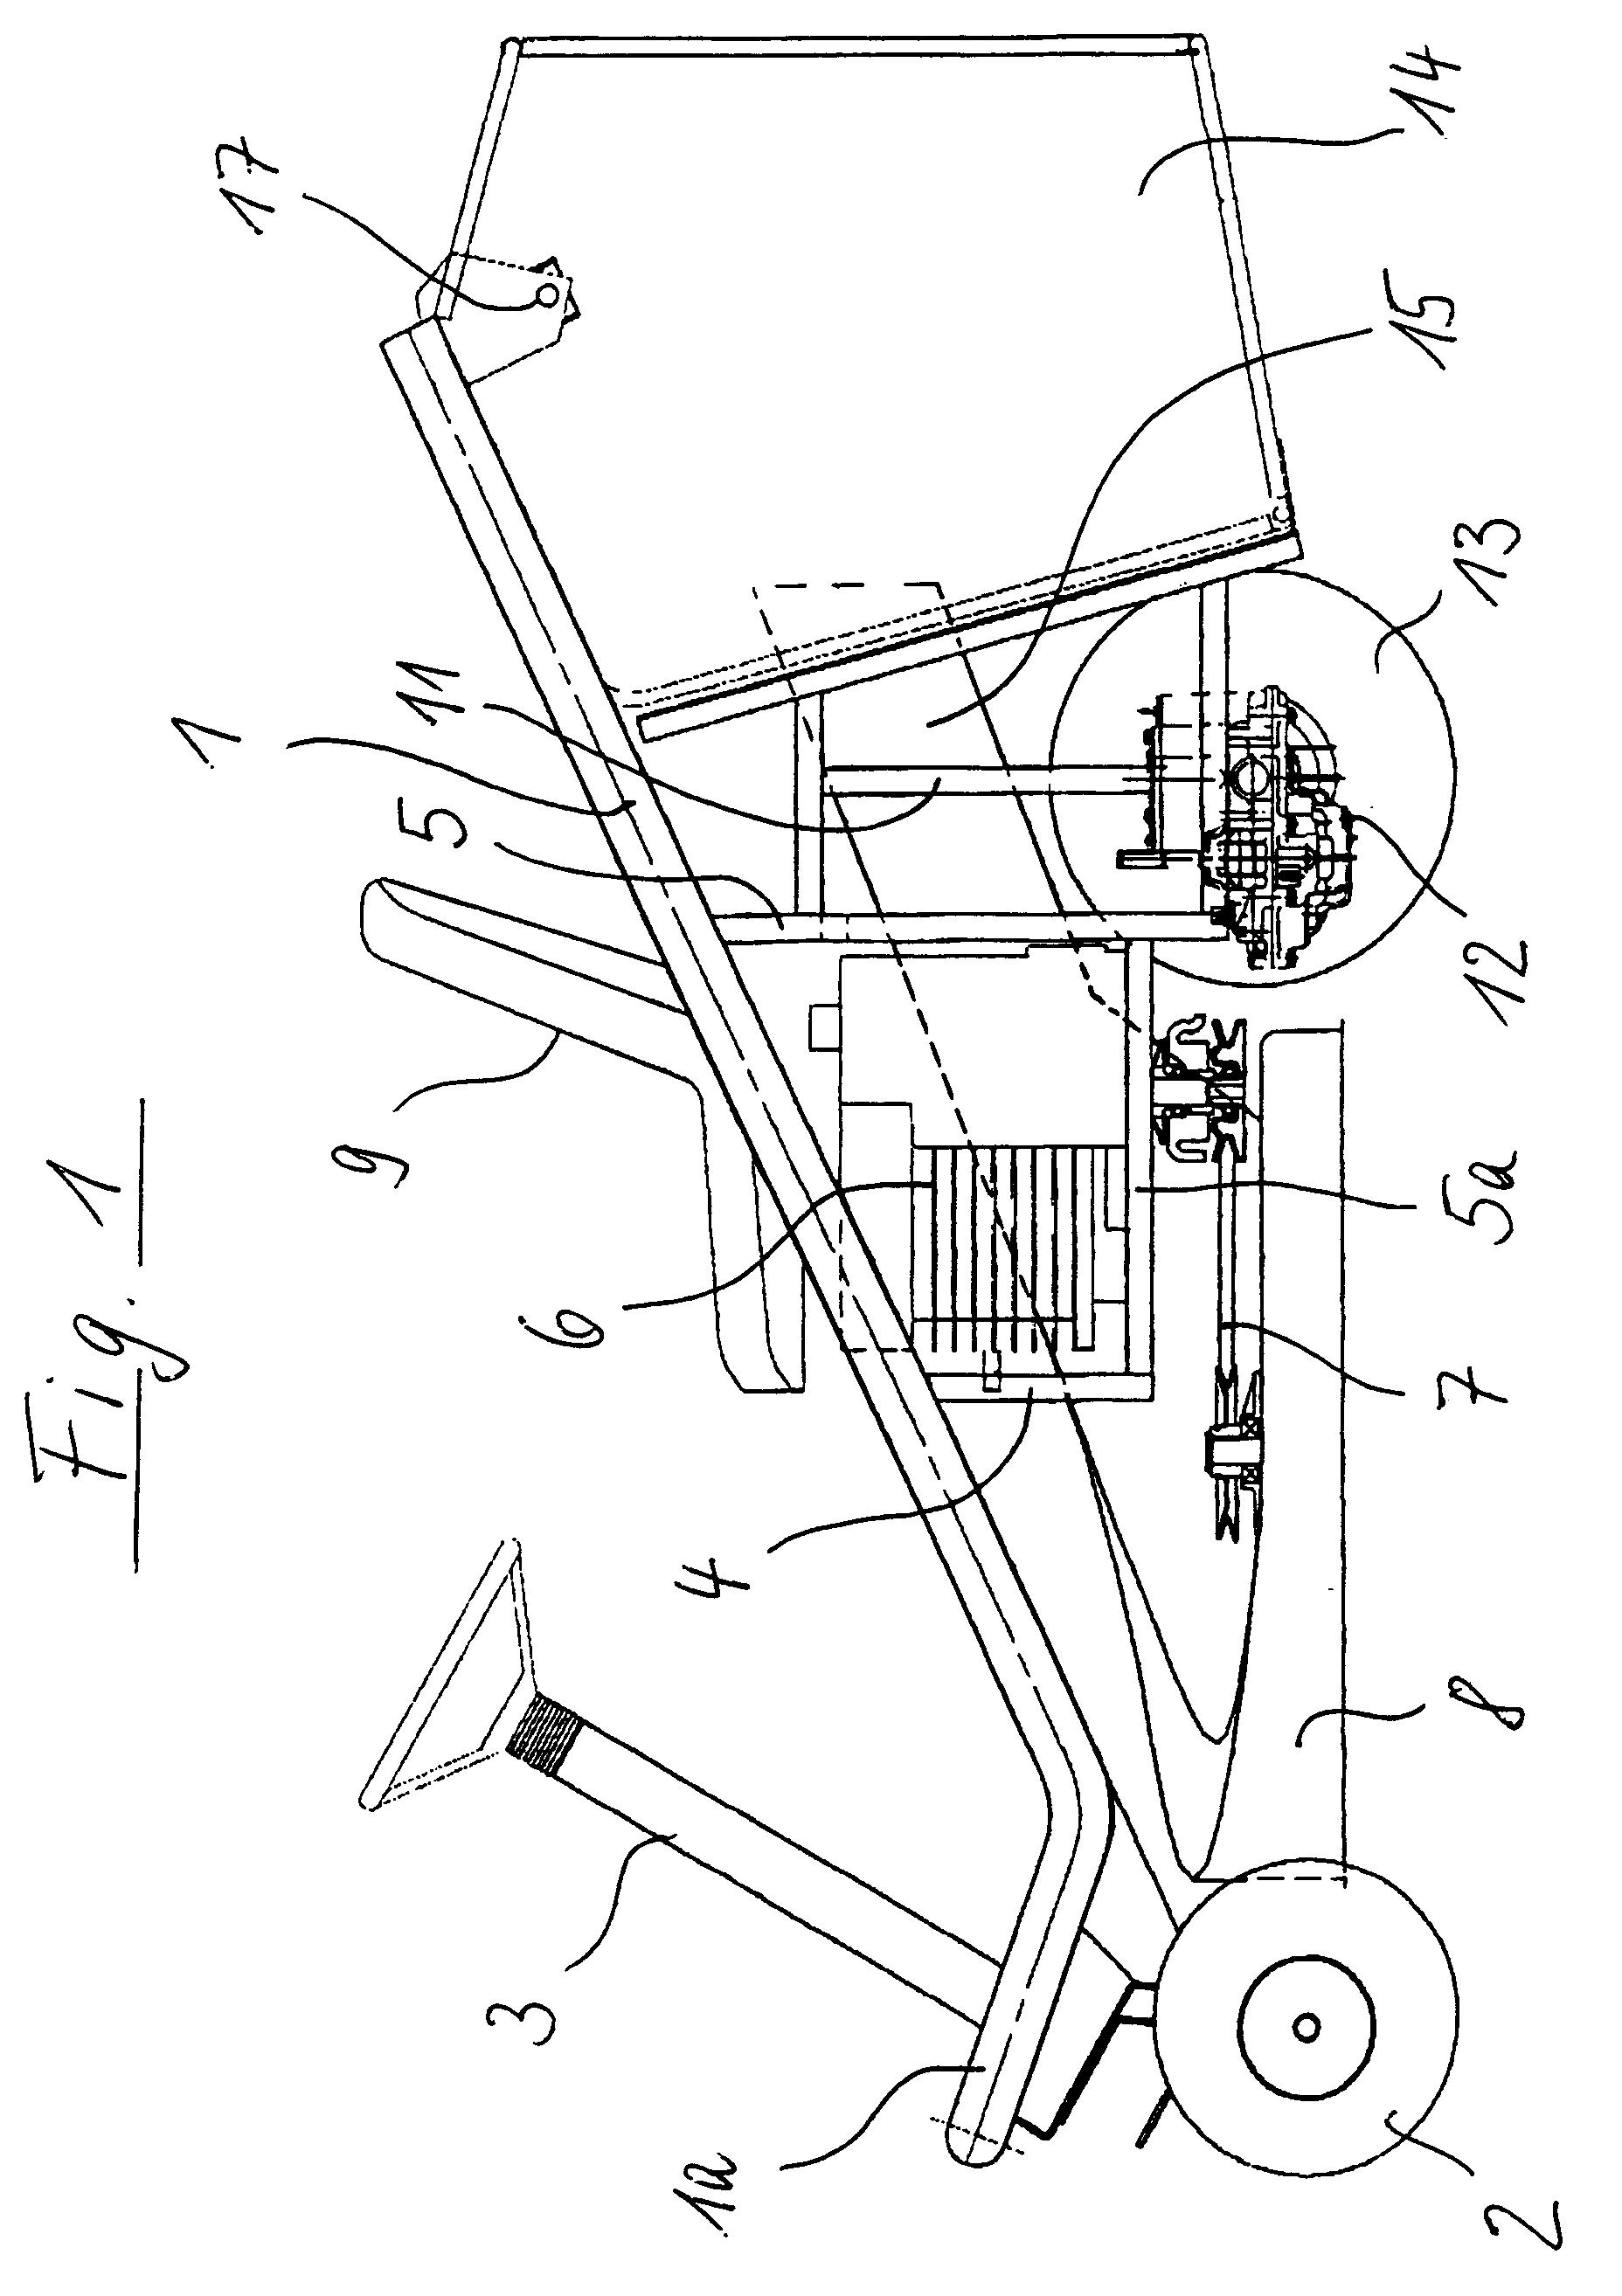 patent ep0678235b1 aufsitz rasenm her google patents. Black Bedroom Furniture Sets. Home Design Ideas